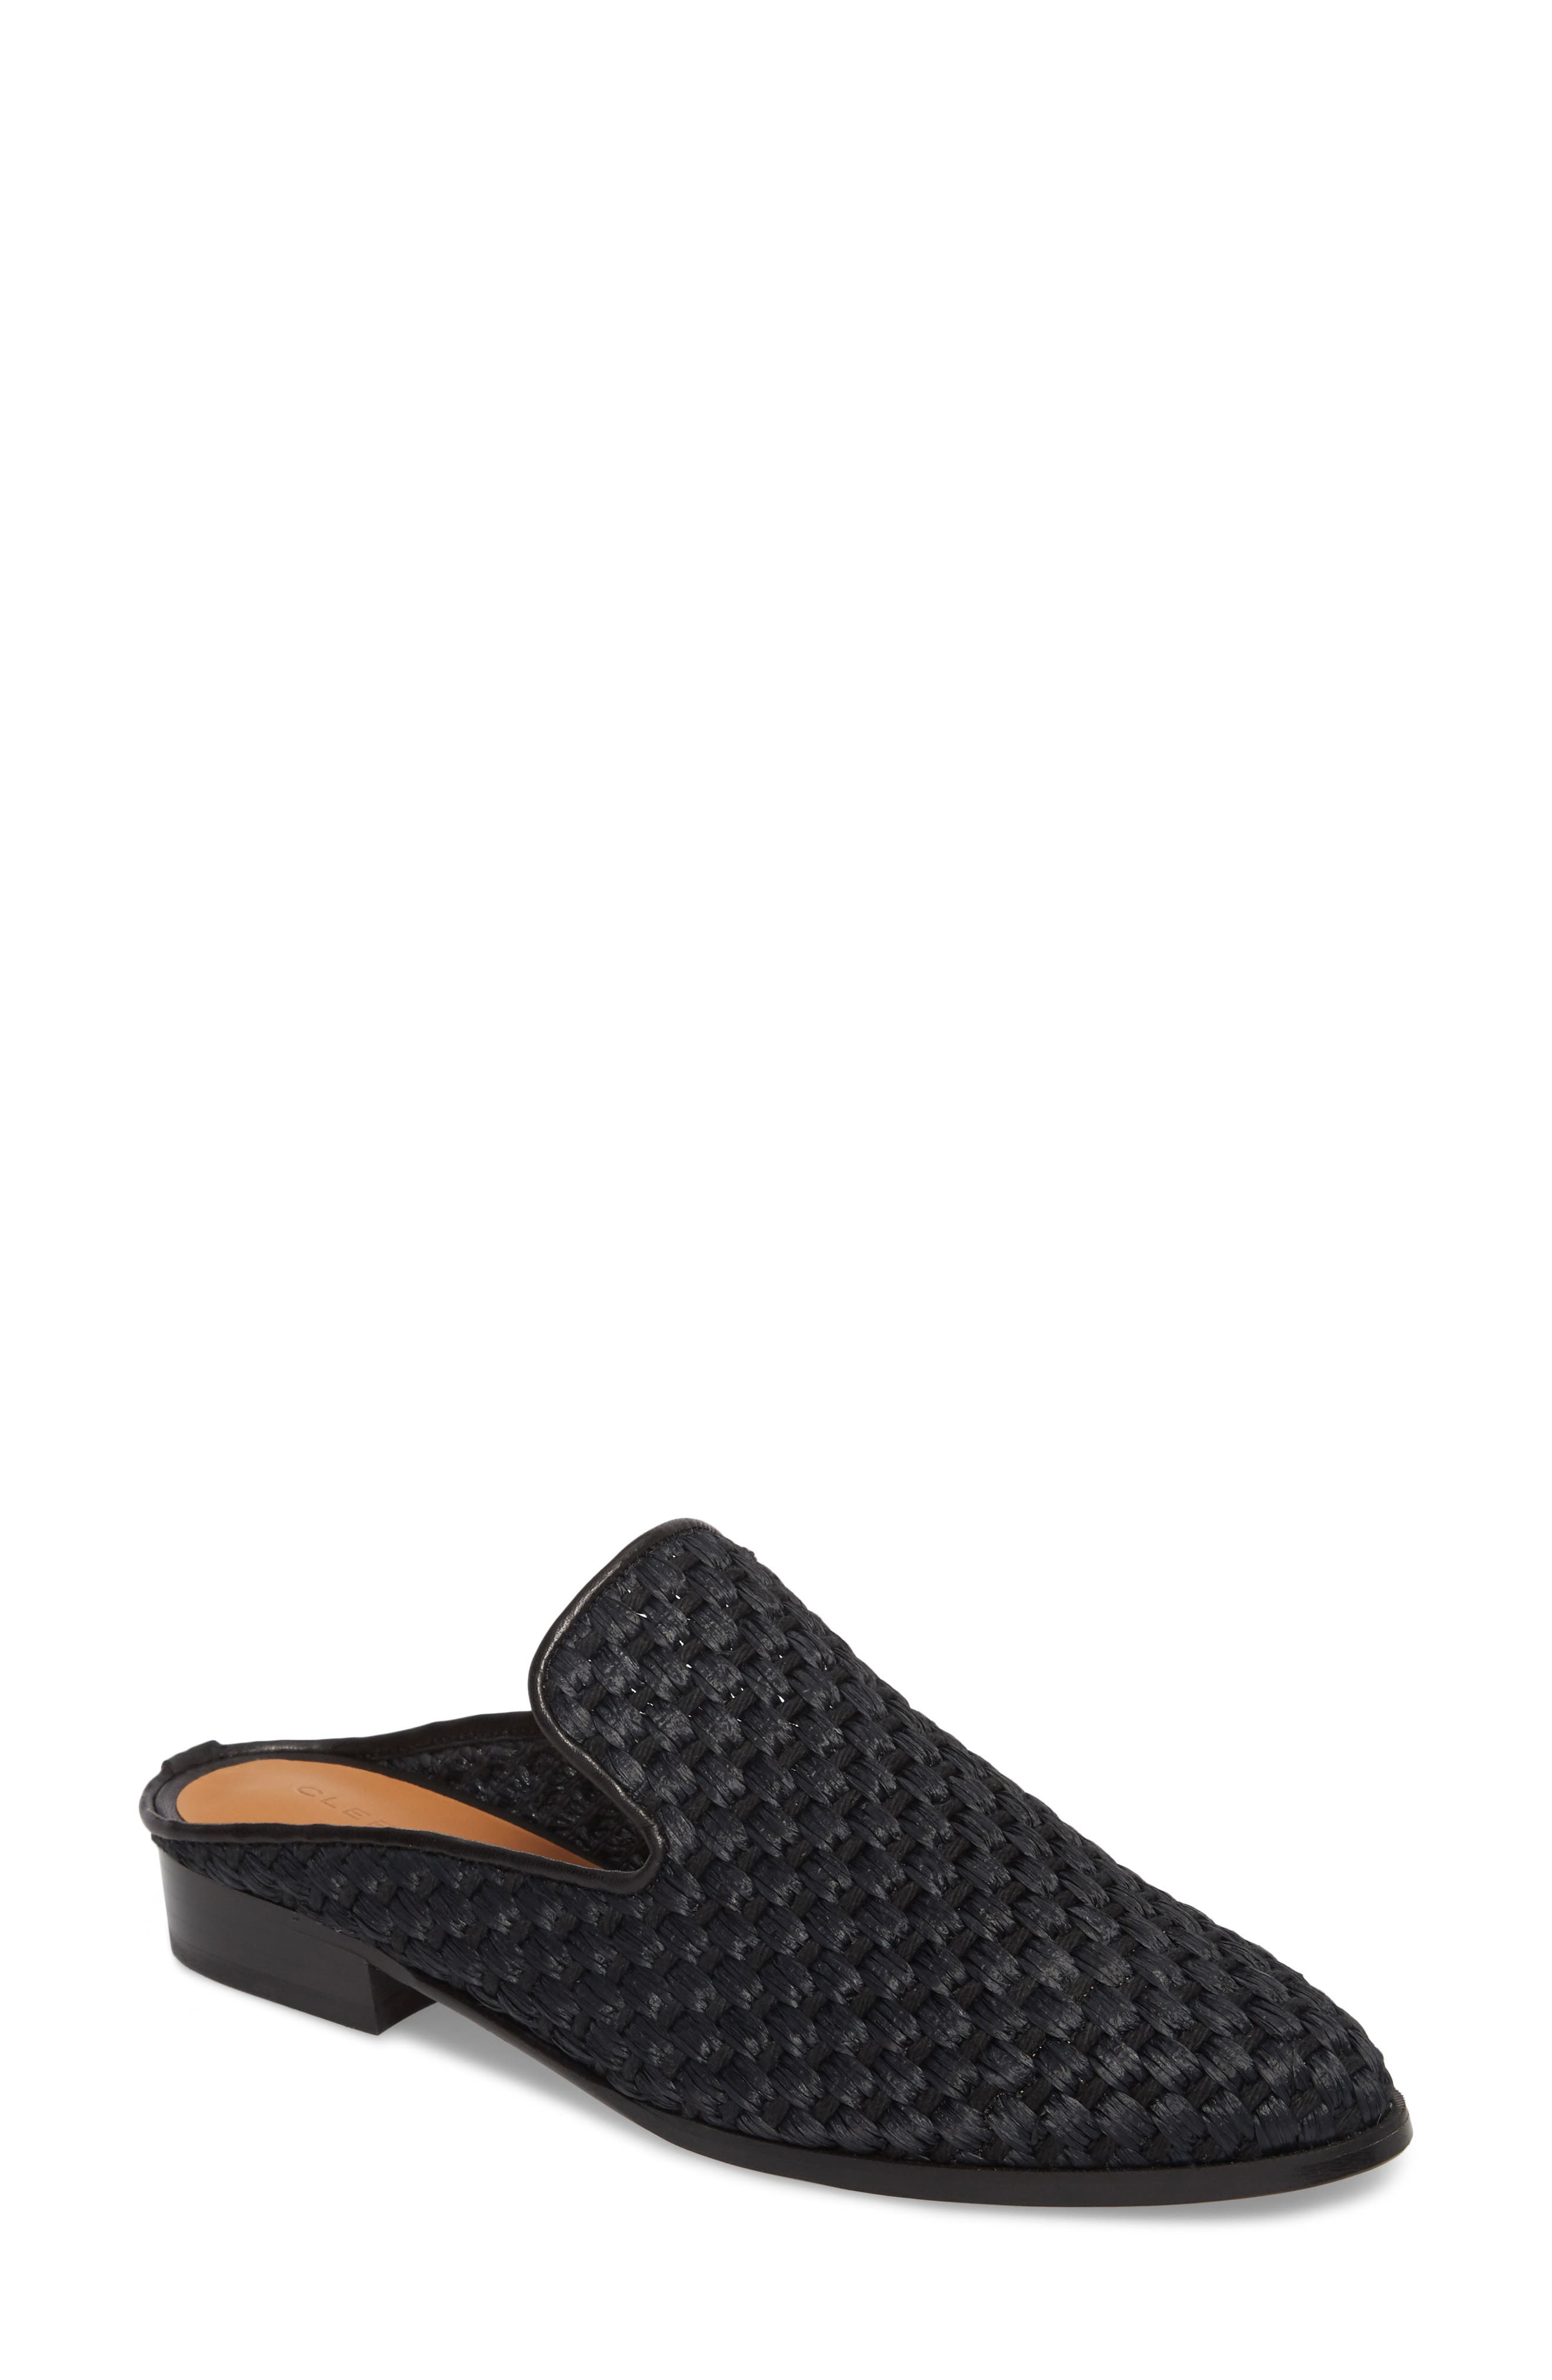 Aliceop Woven Loafer Mule,                         Main,                         color, Black